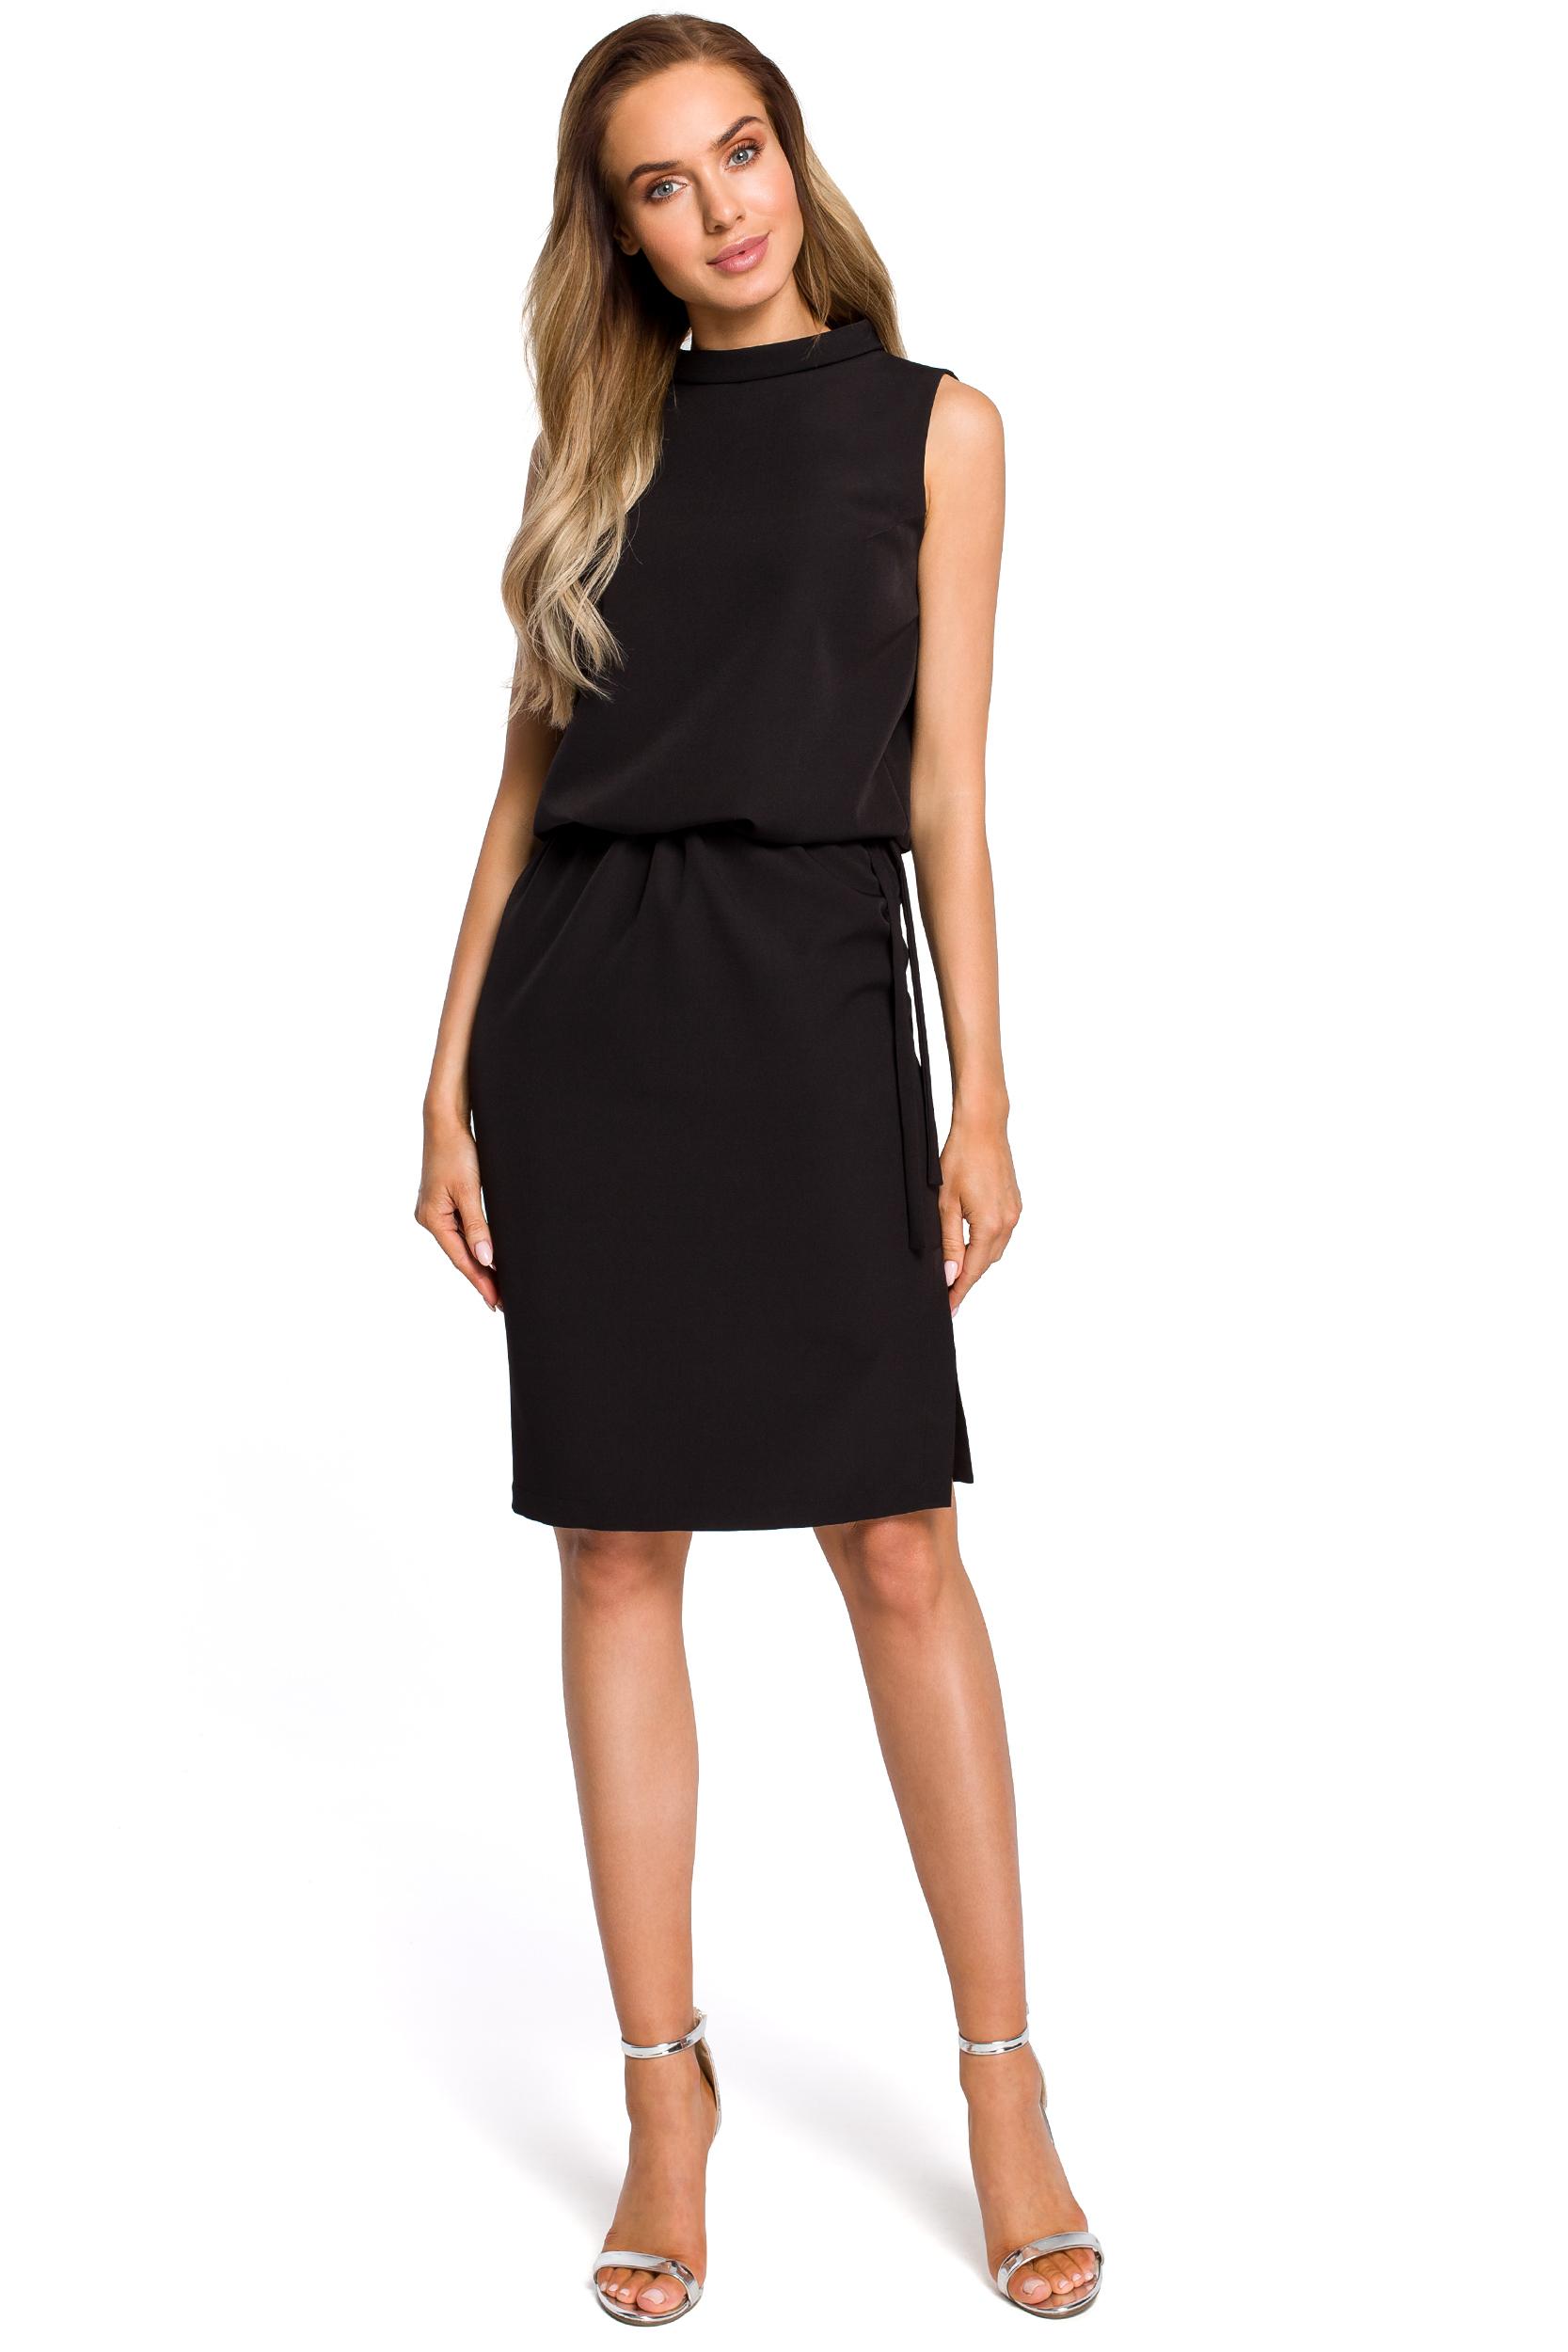 b161052ca98 Γυναικεία Ρούχα, Γυναικεία Φορέματα, Midi Φόρεμα